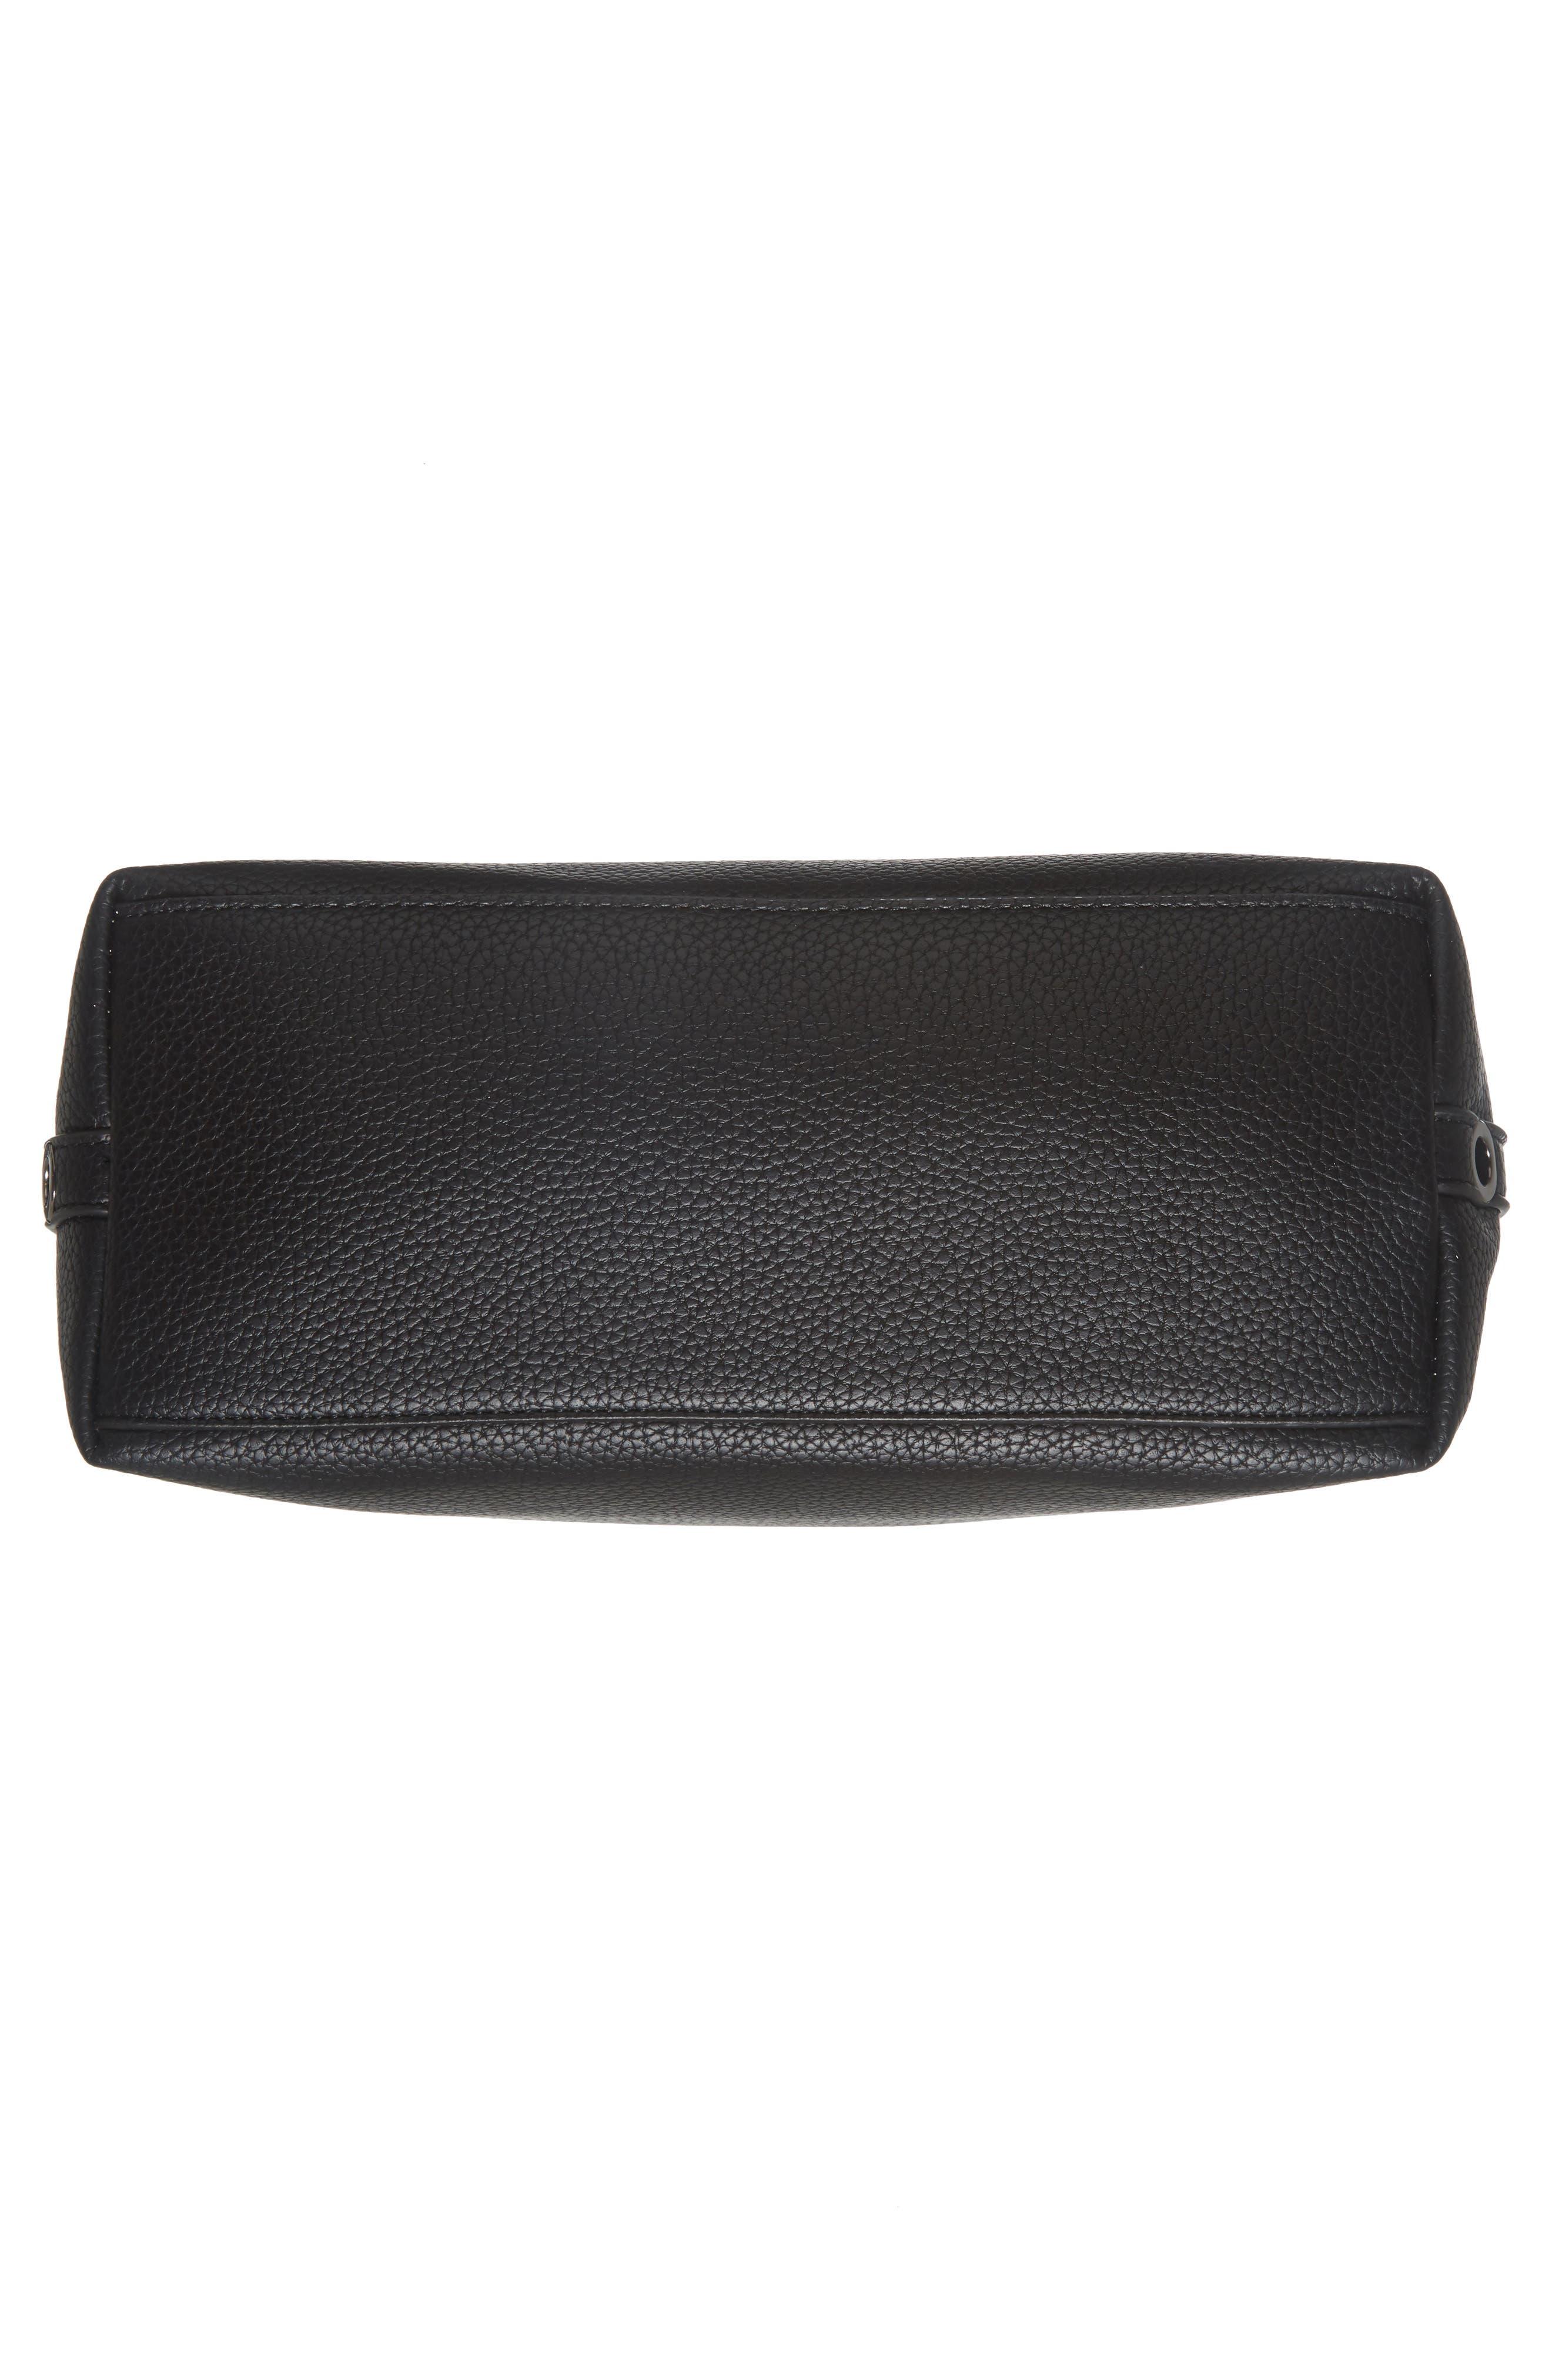 Samara Faux Leather Shoulder Bag,                             Alternate thumbnail 6, color,                             001